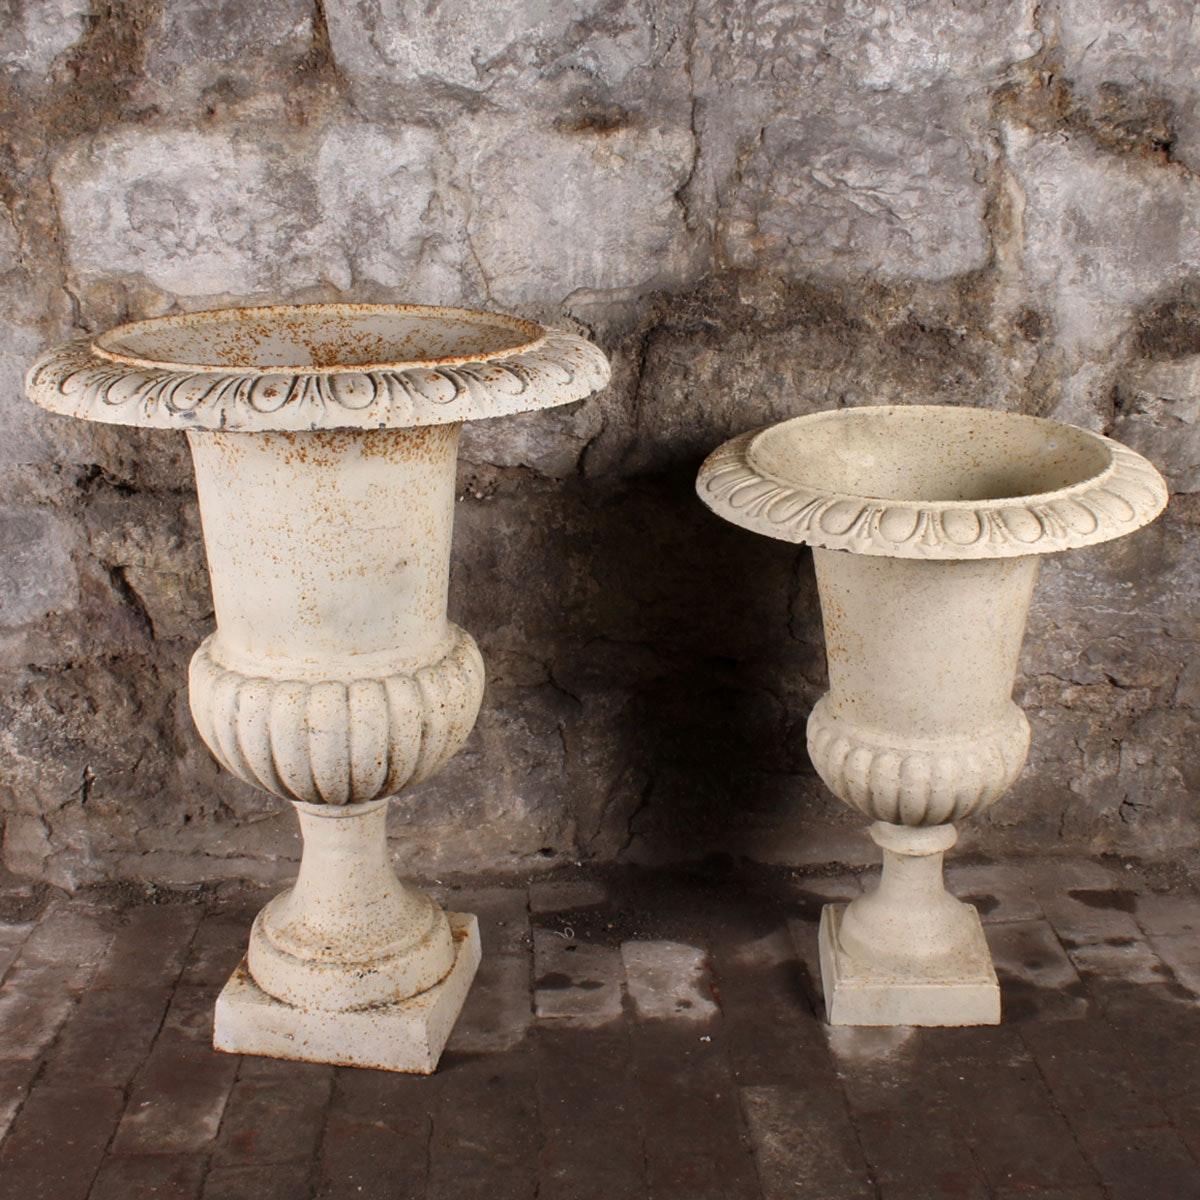 Two Matching Metal Urn Planters